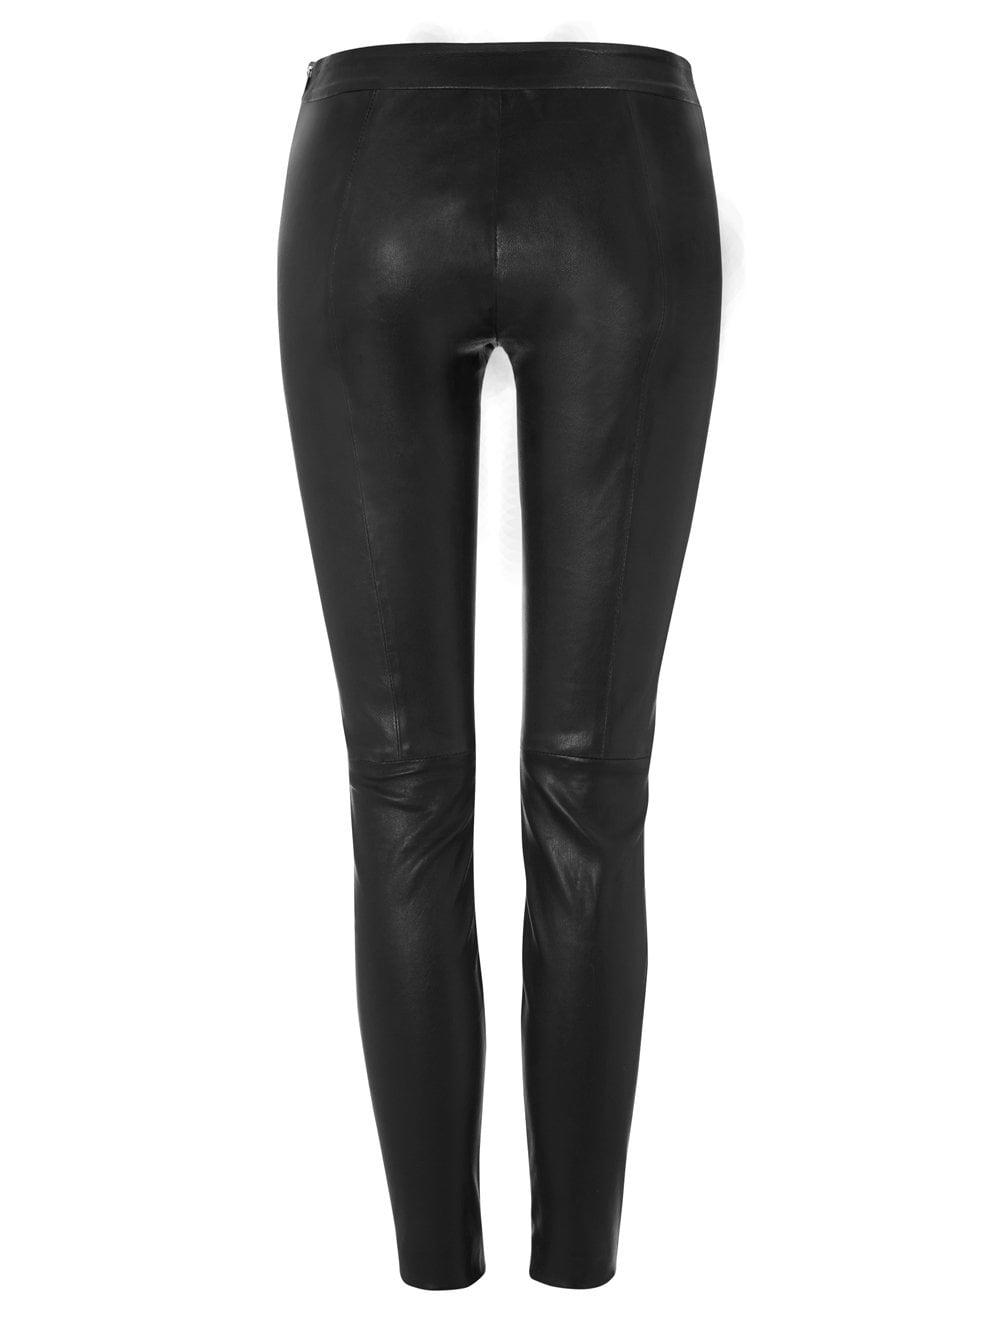 Palawa Black Stretch Leather Leggings